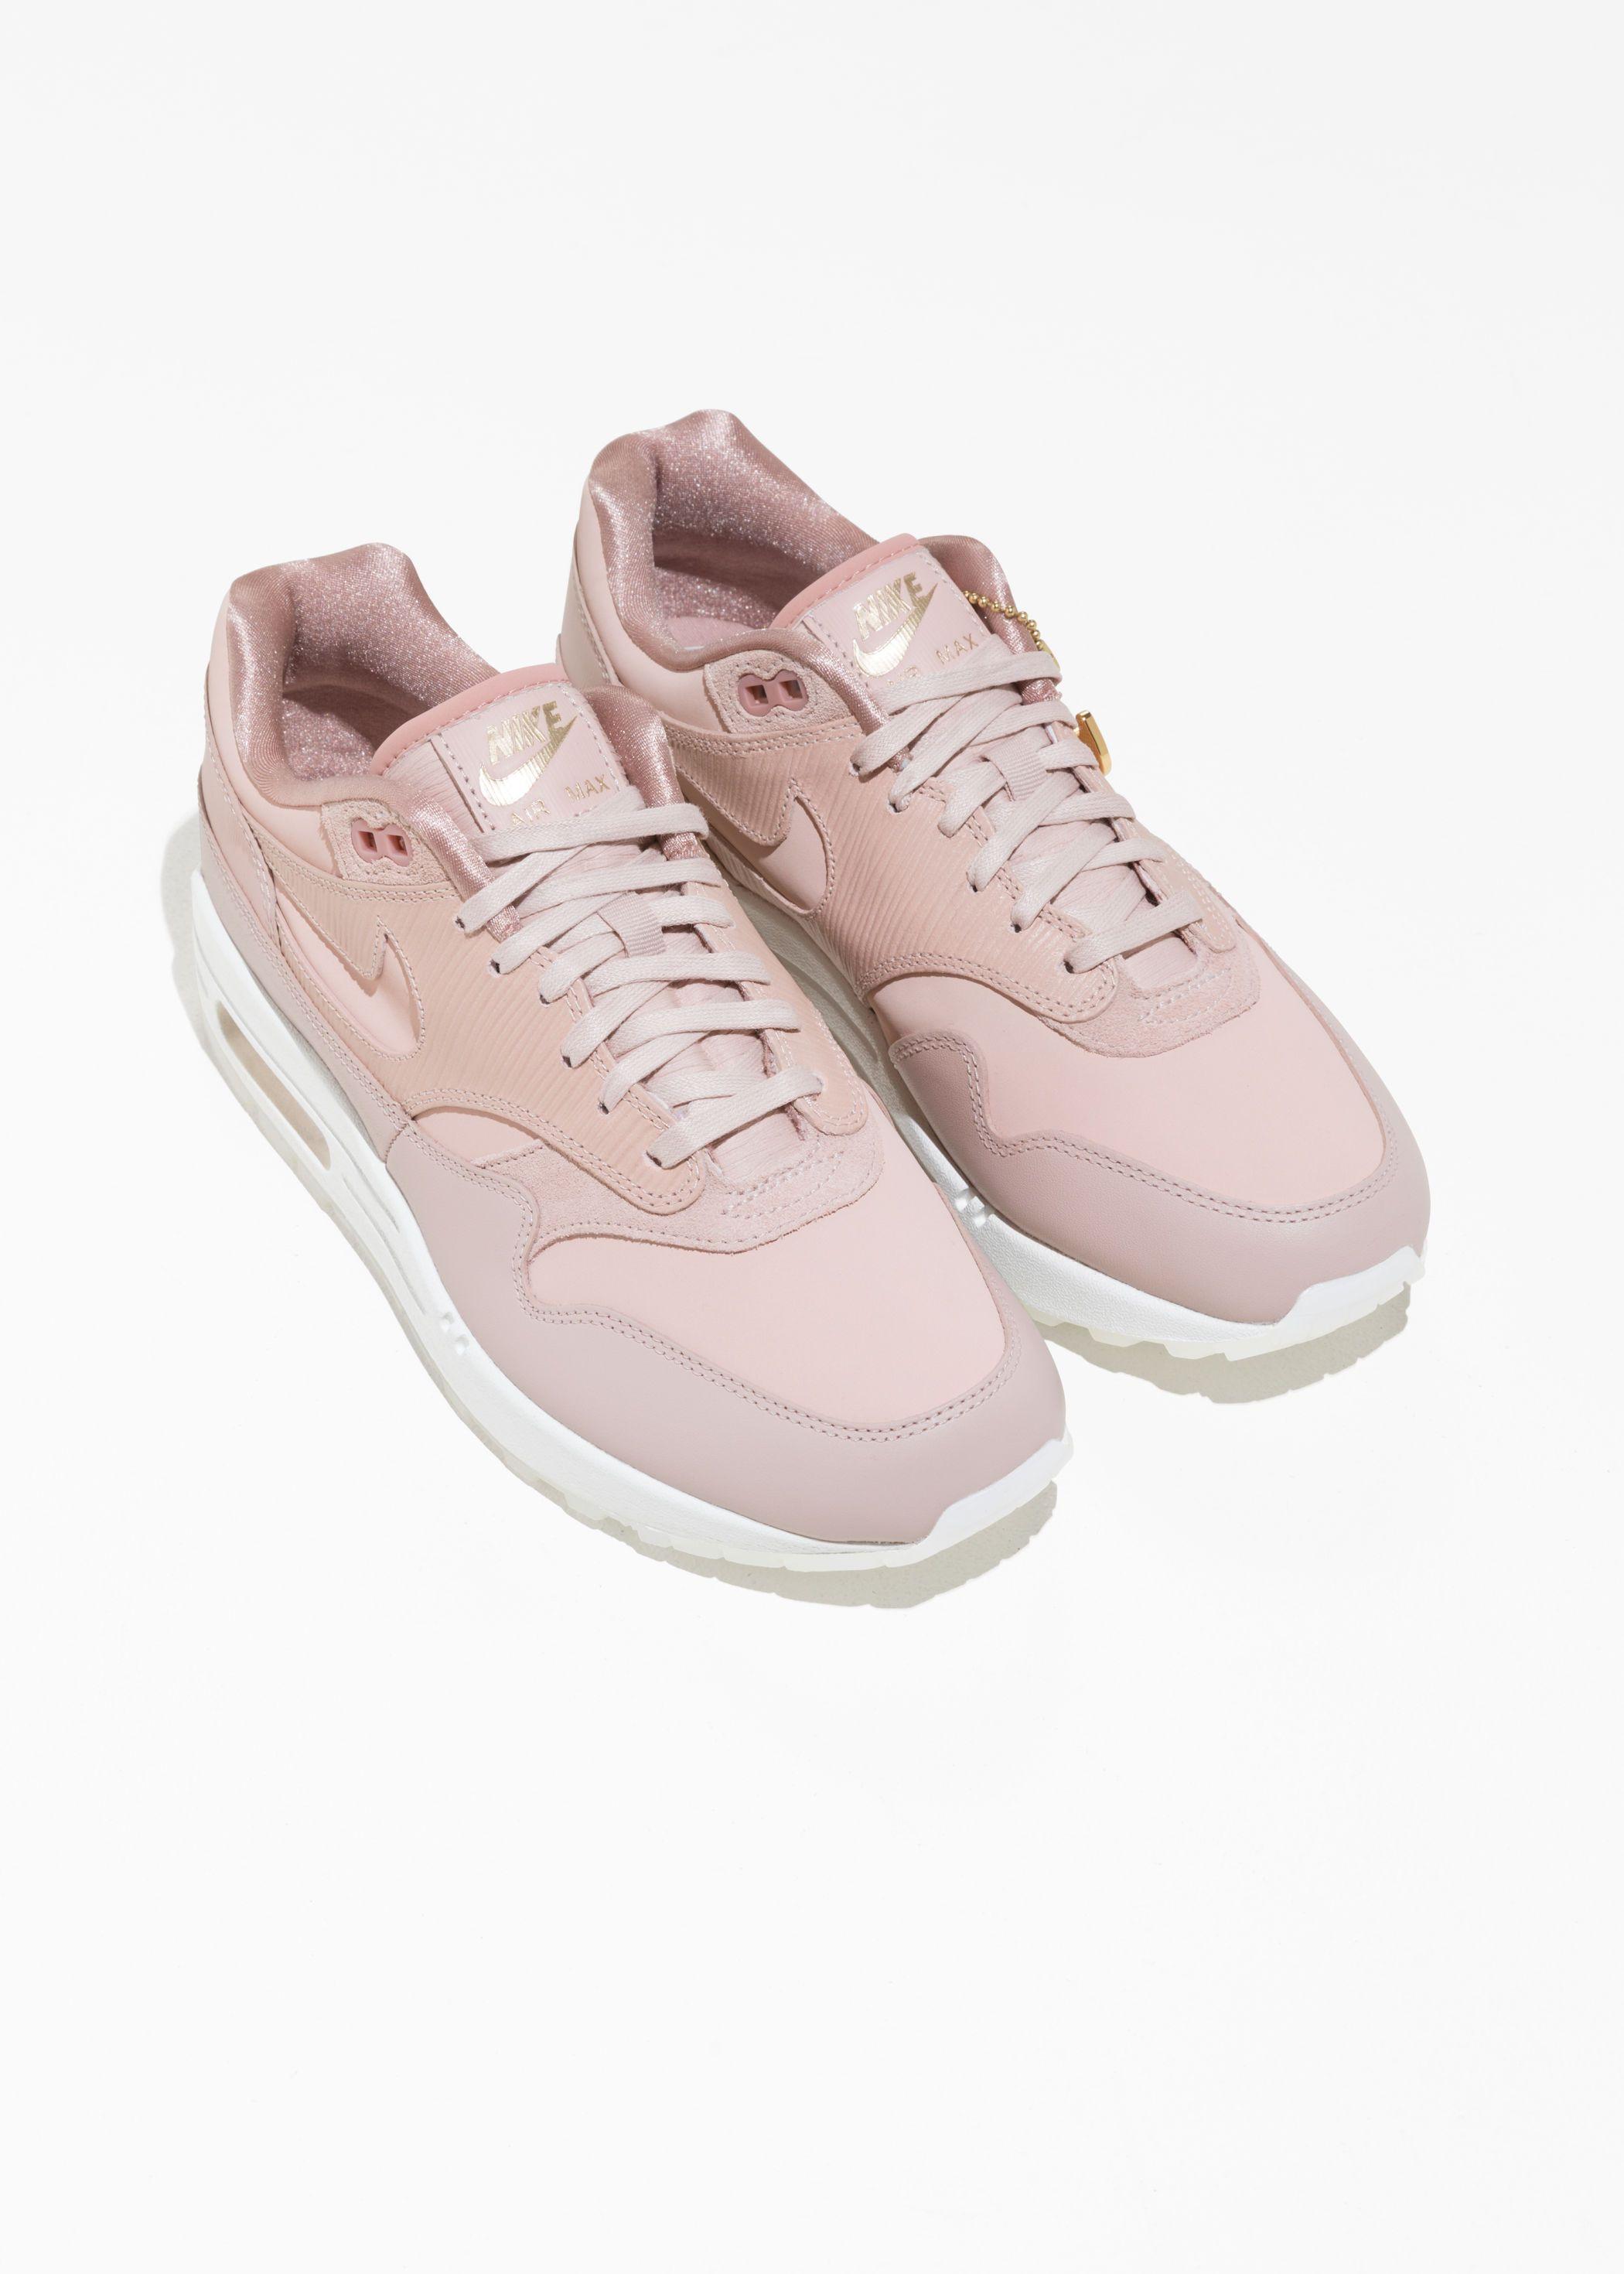 promo code be3d5 a8f17 Nike Air max 1 PRM - Salmon - Nike